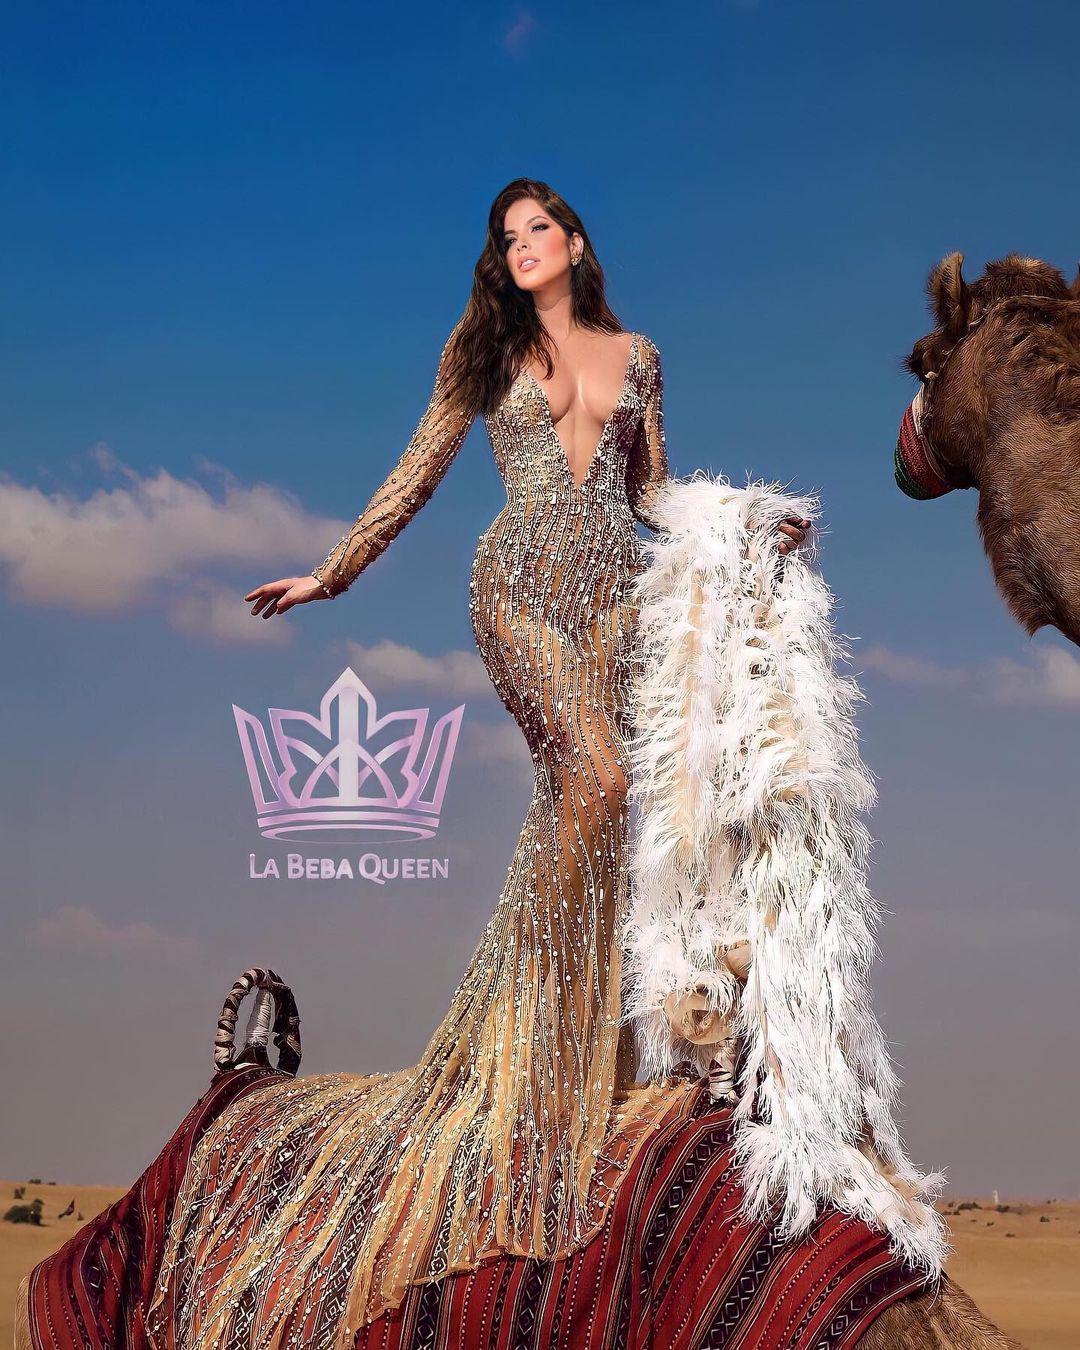 laura olascuaga, miss colombia universo 2020. - Página 11 Y9gbi10